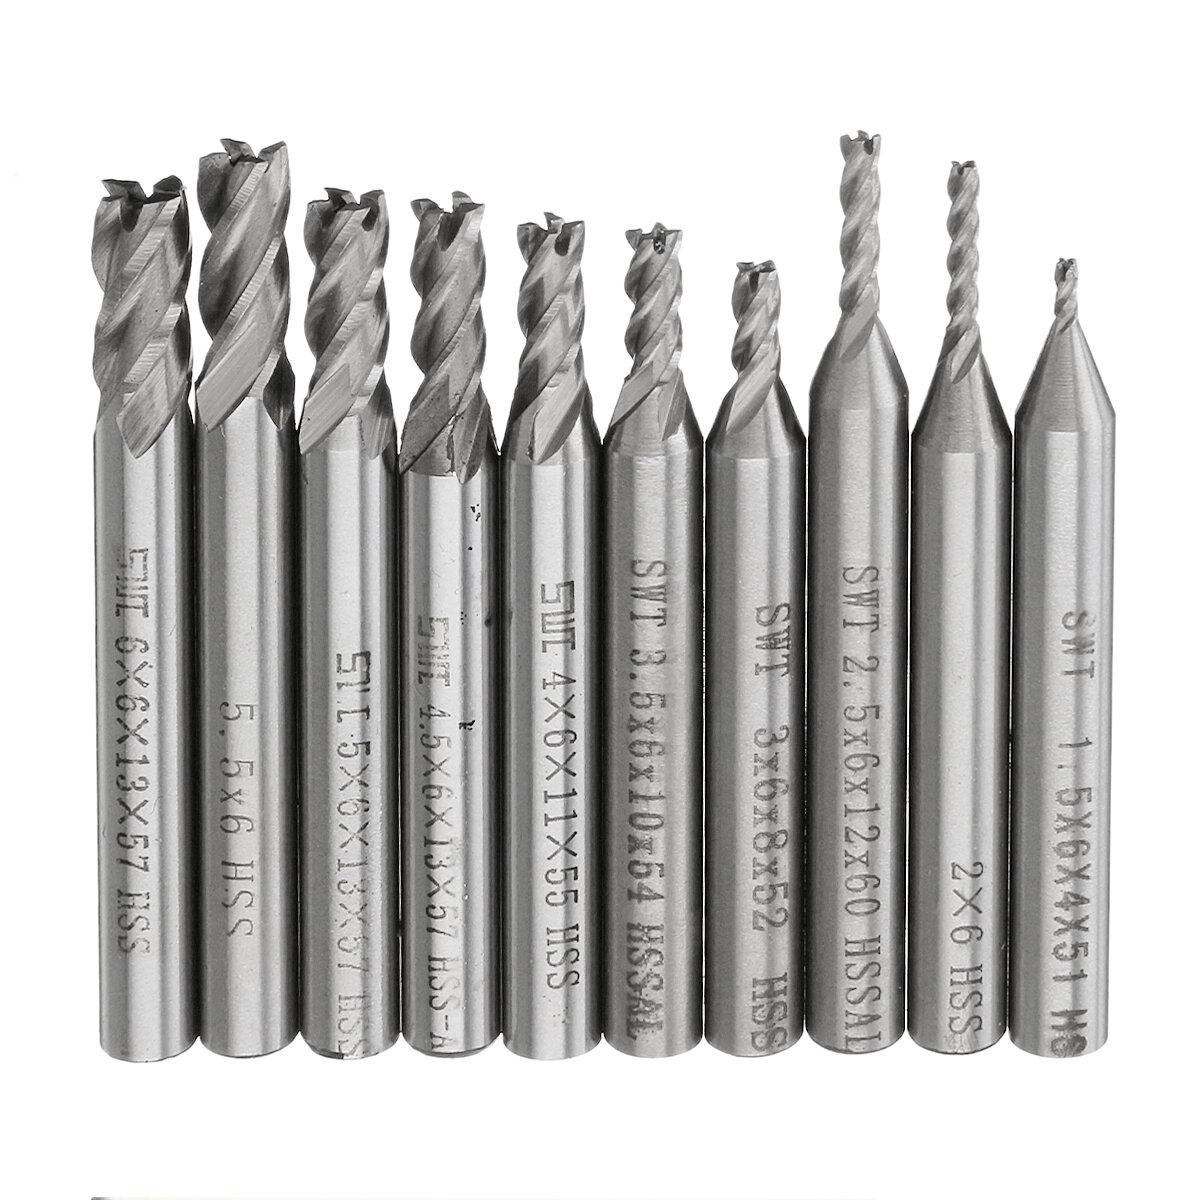 Drillpro 10pcs 1.5-6mm HSS 4 ขลุ่ยปลายมิลล์ตัด 6mm Straight Shank CNC เจาะ ชุดบิท